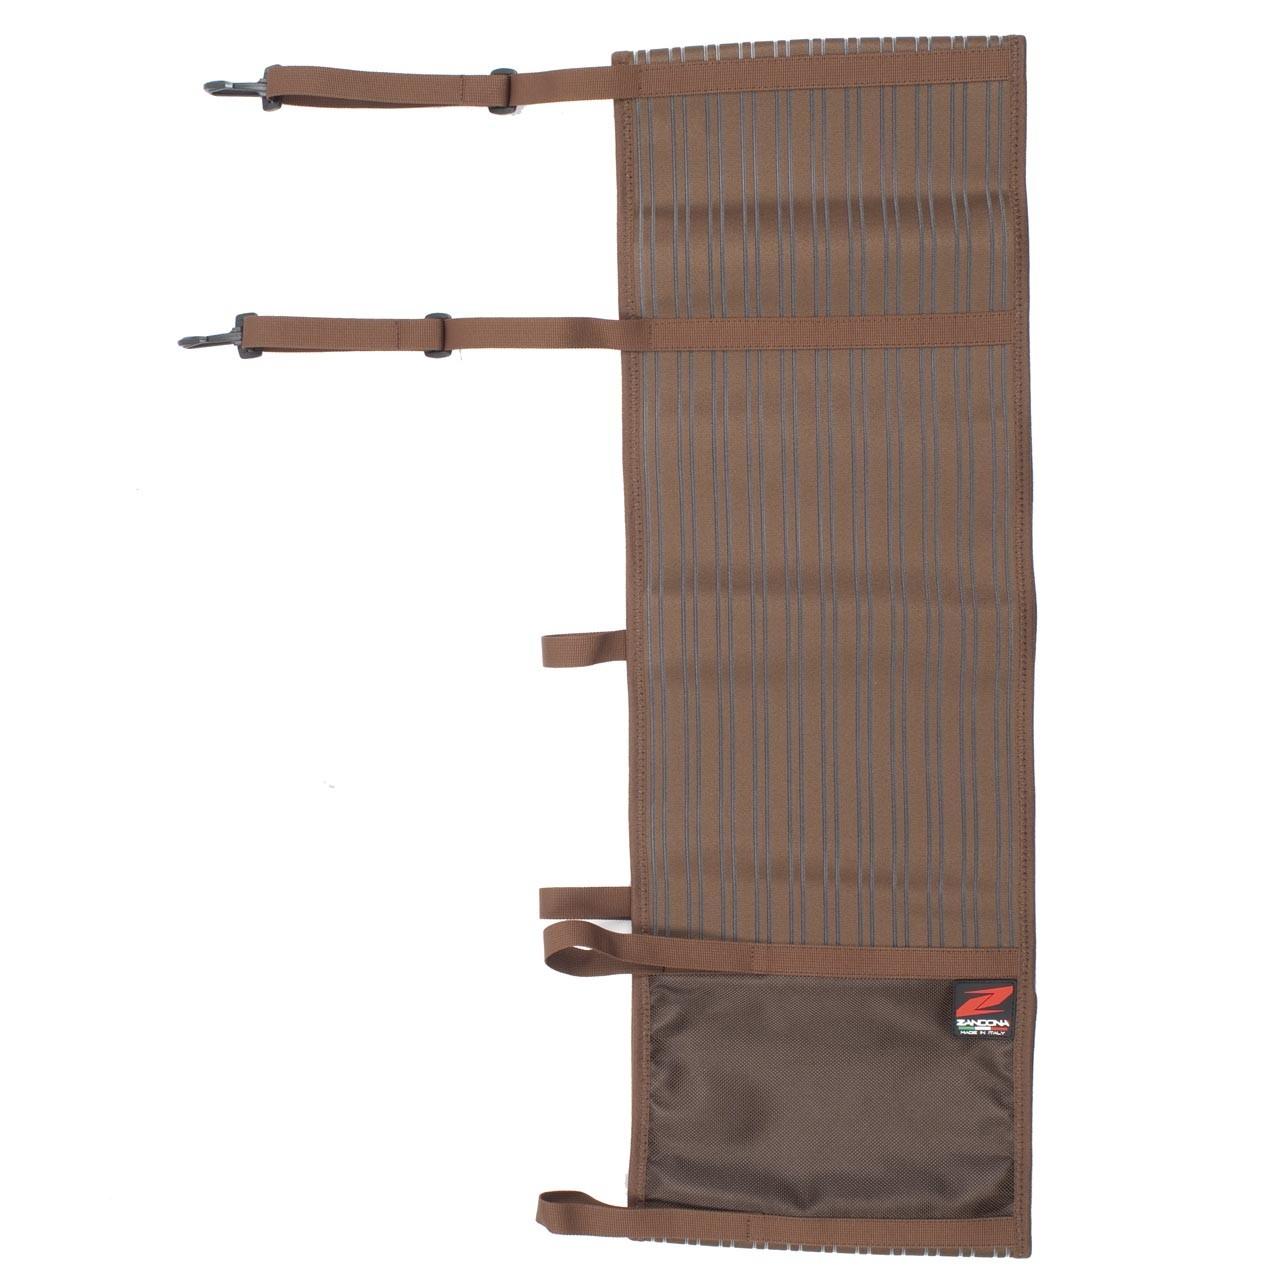 Zandona Superior Chafe Guard bodybandage bruin maat:m